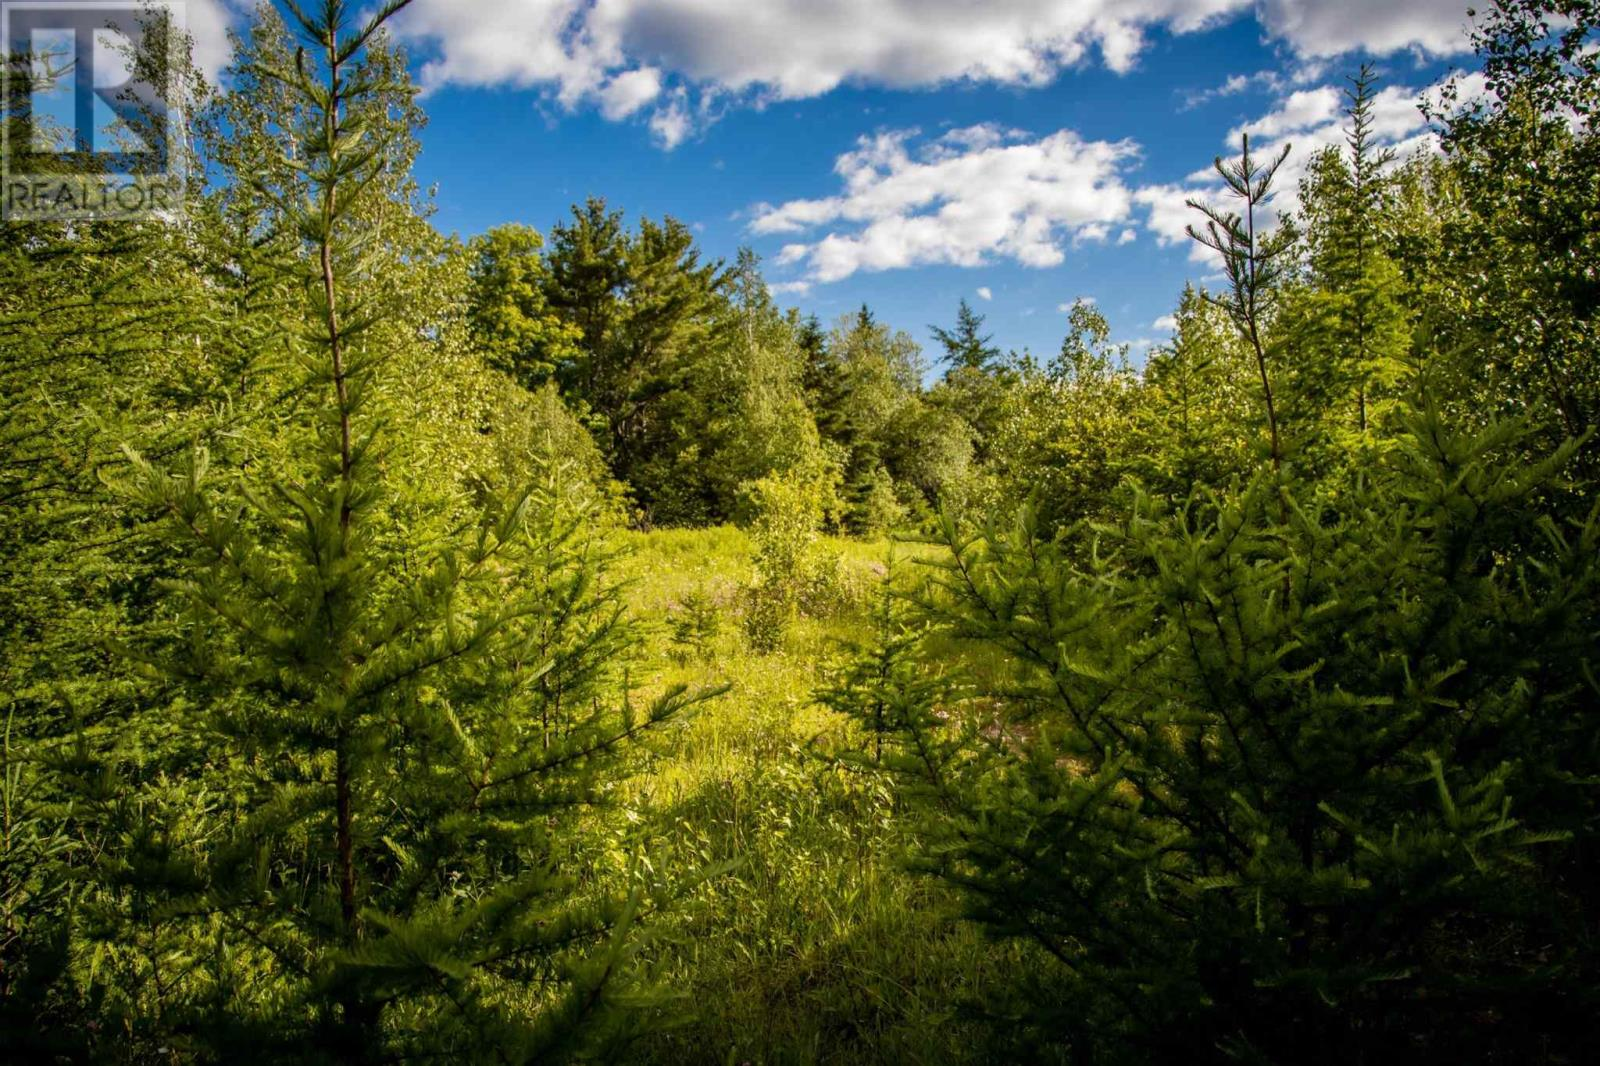 Lot A5 Aylesford Road, Lake Paul, Nova Scotia  B0P 1C0 - Photo 1 - 202115393